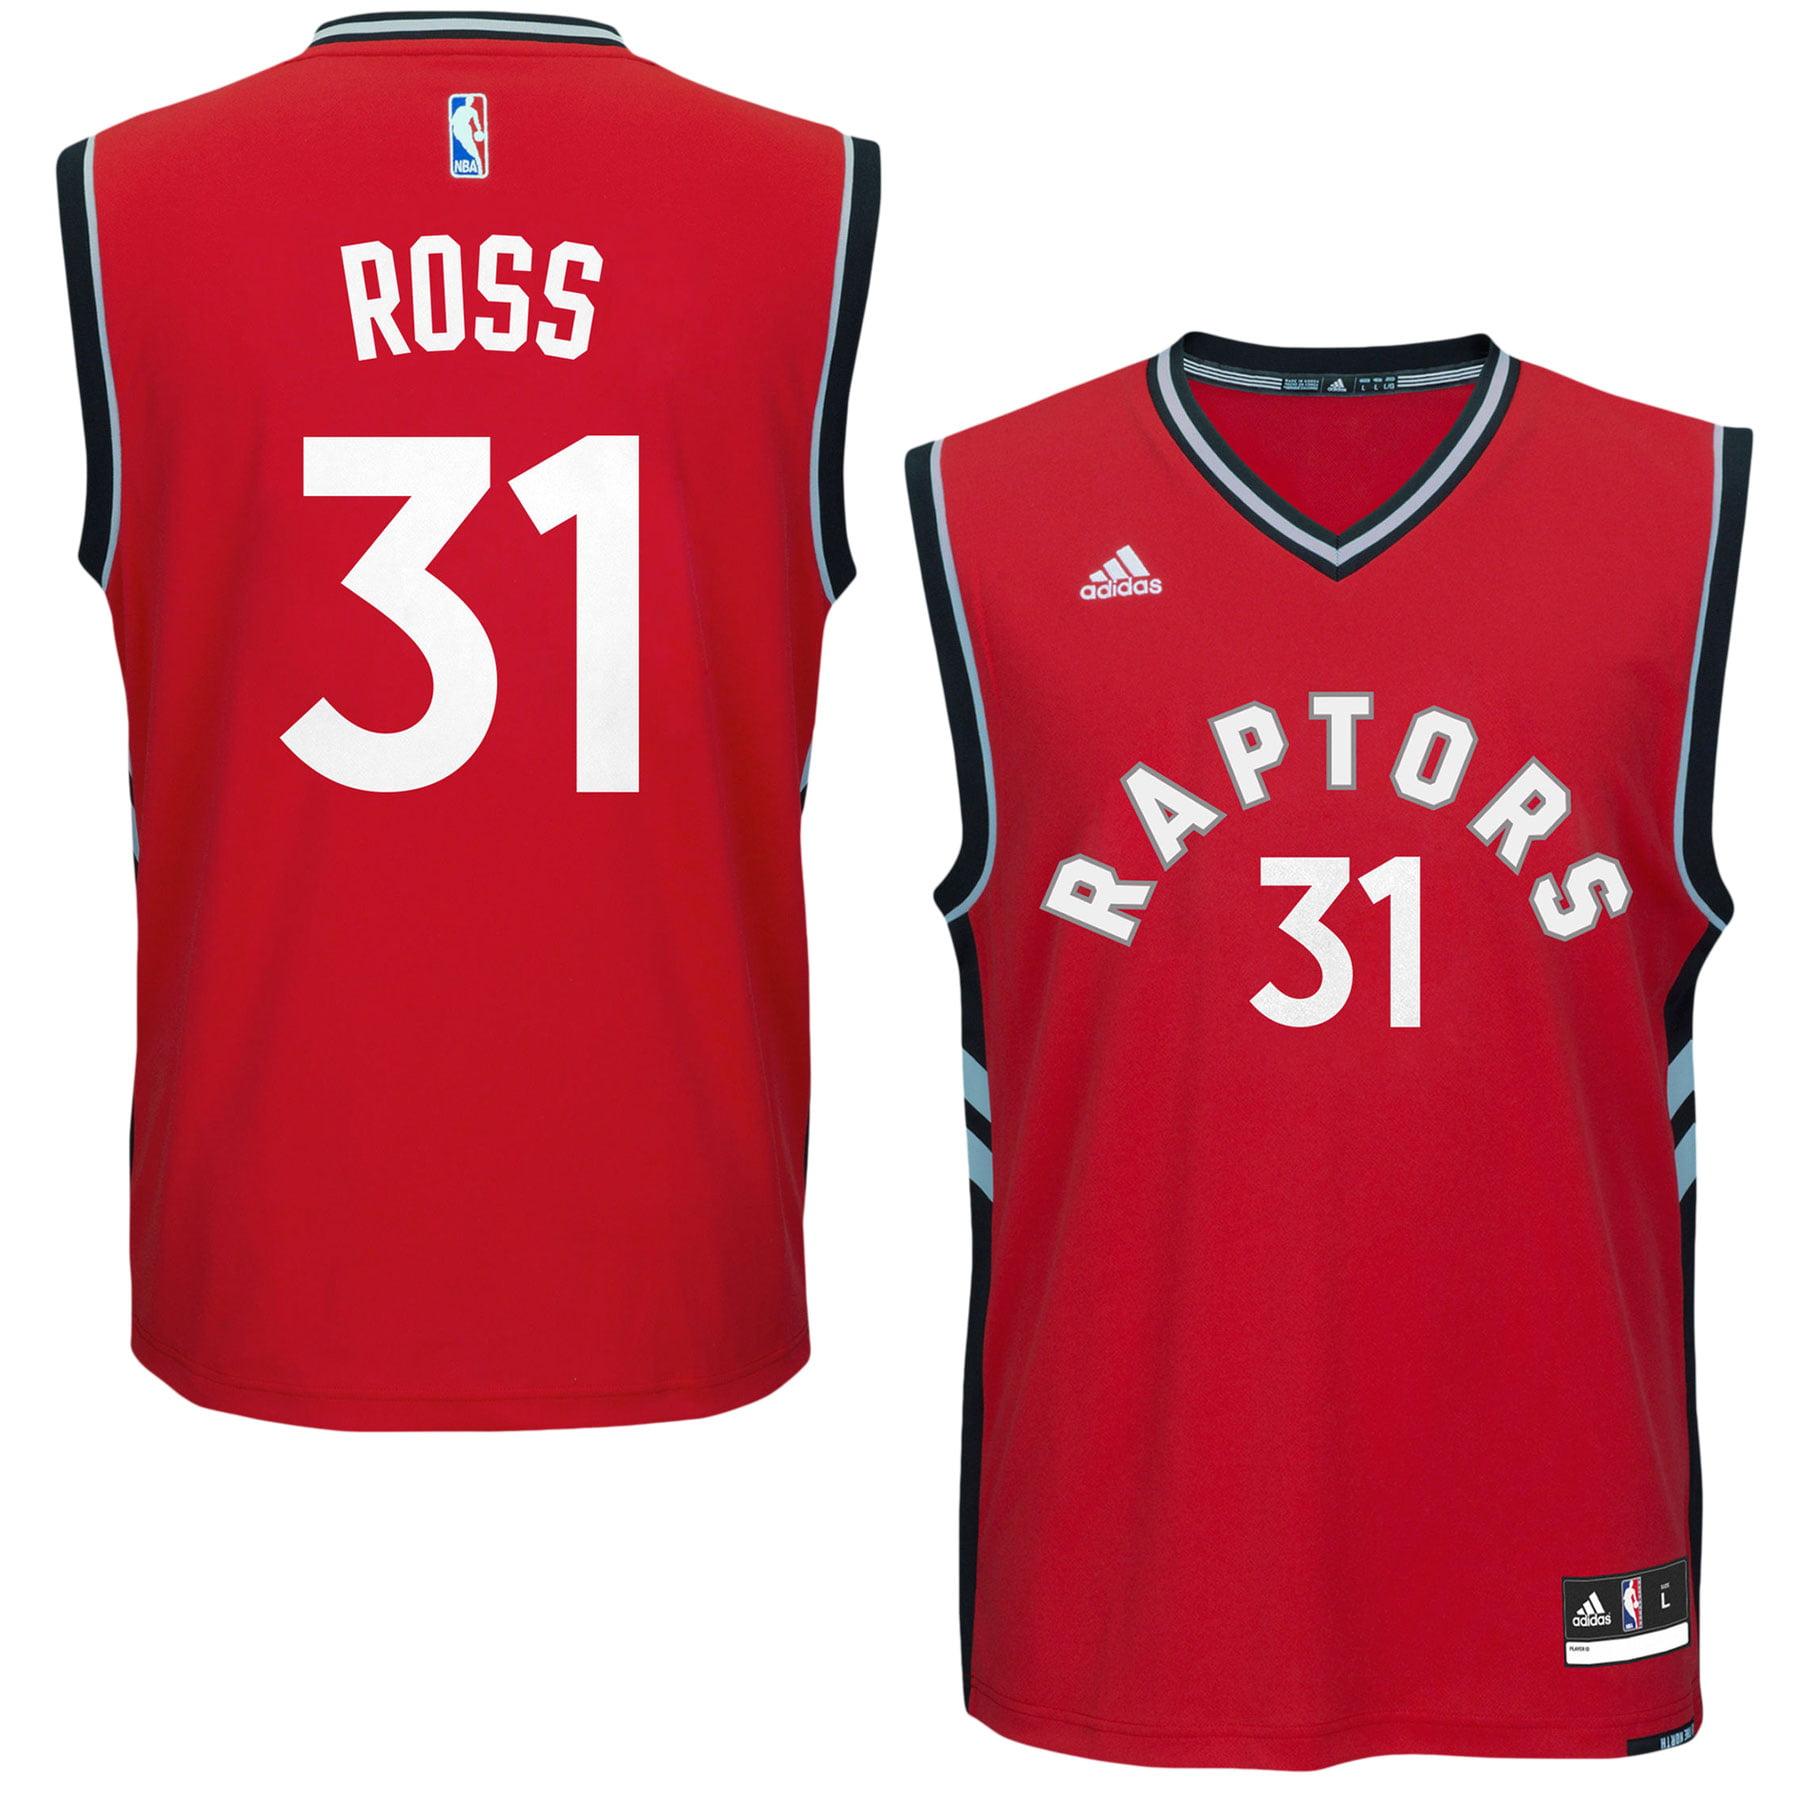 662554e3a Terrence Ross Toronto Raptors NBA Swingman Replica Jersey - Red - Medium